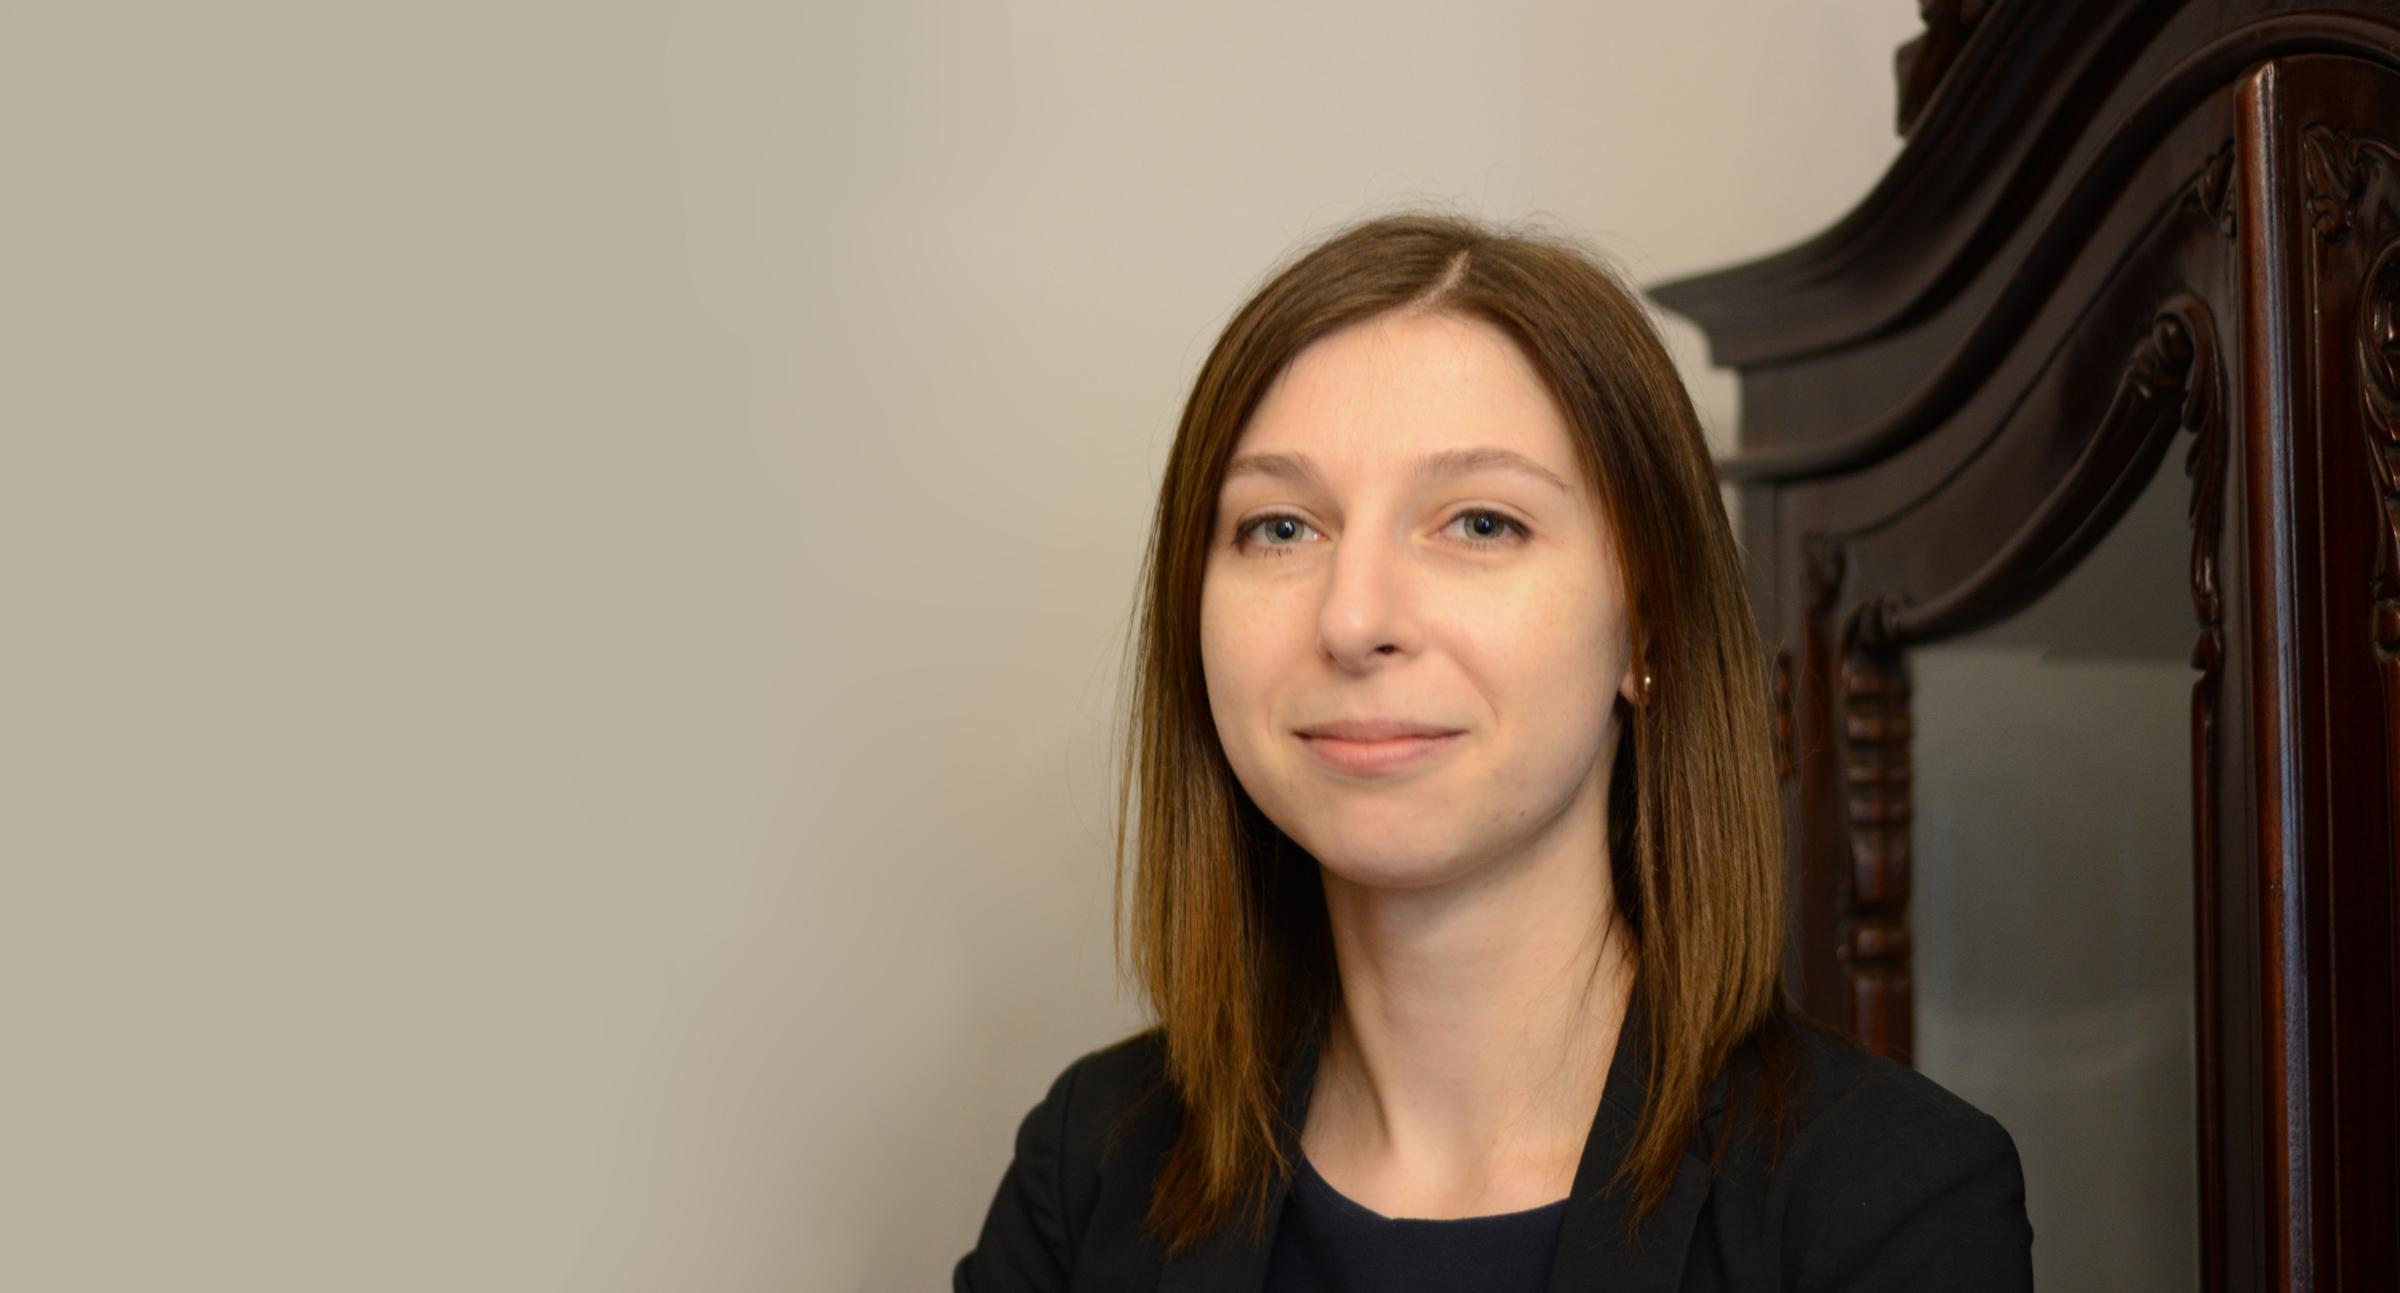 Magdalena Seniw - adwokat, prawo cywilne, kancelaria adwokacka Ius Cogens w Toruniu